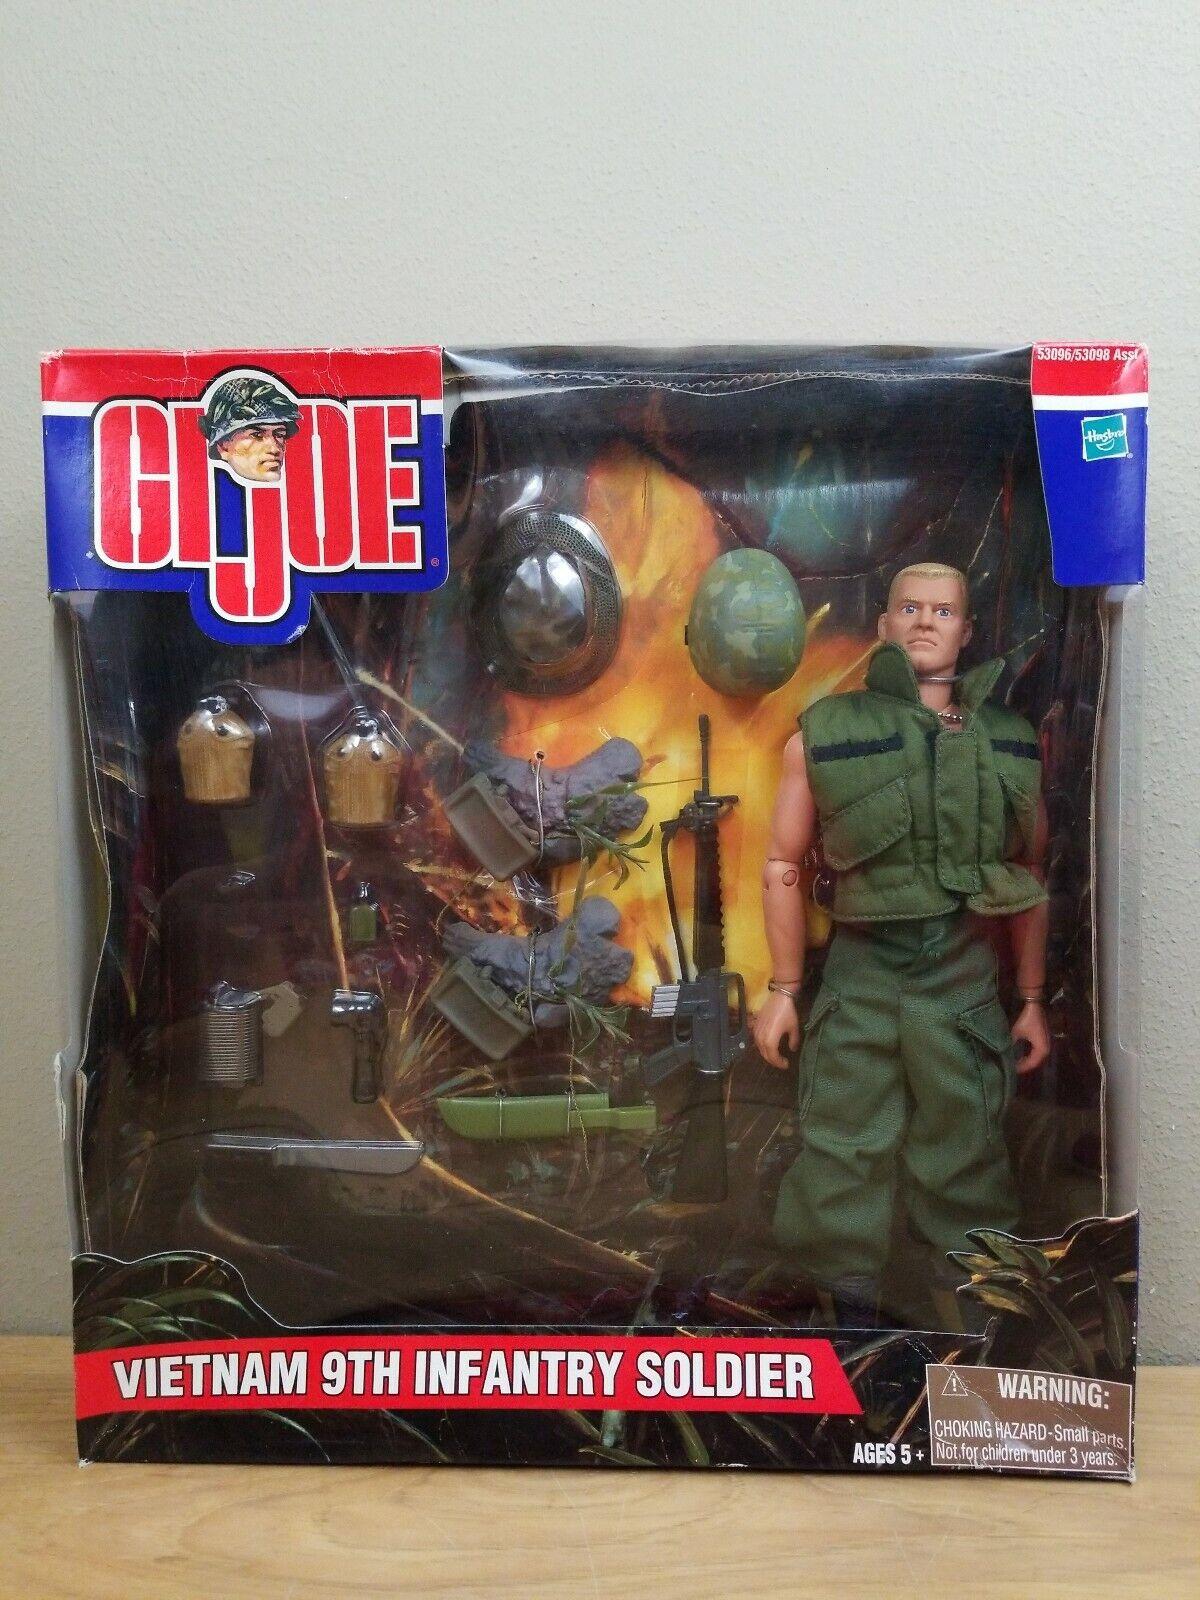 G.I. Joe Vietnam 9th Infantry Soldier Figurine action figure military MIL1